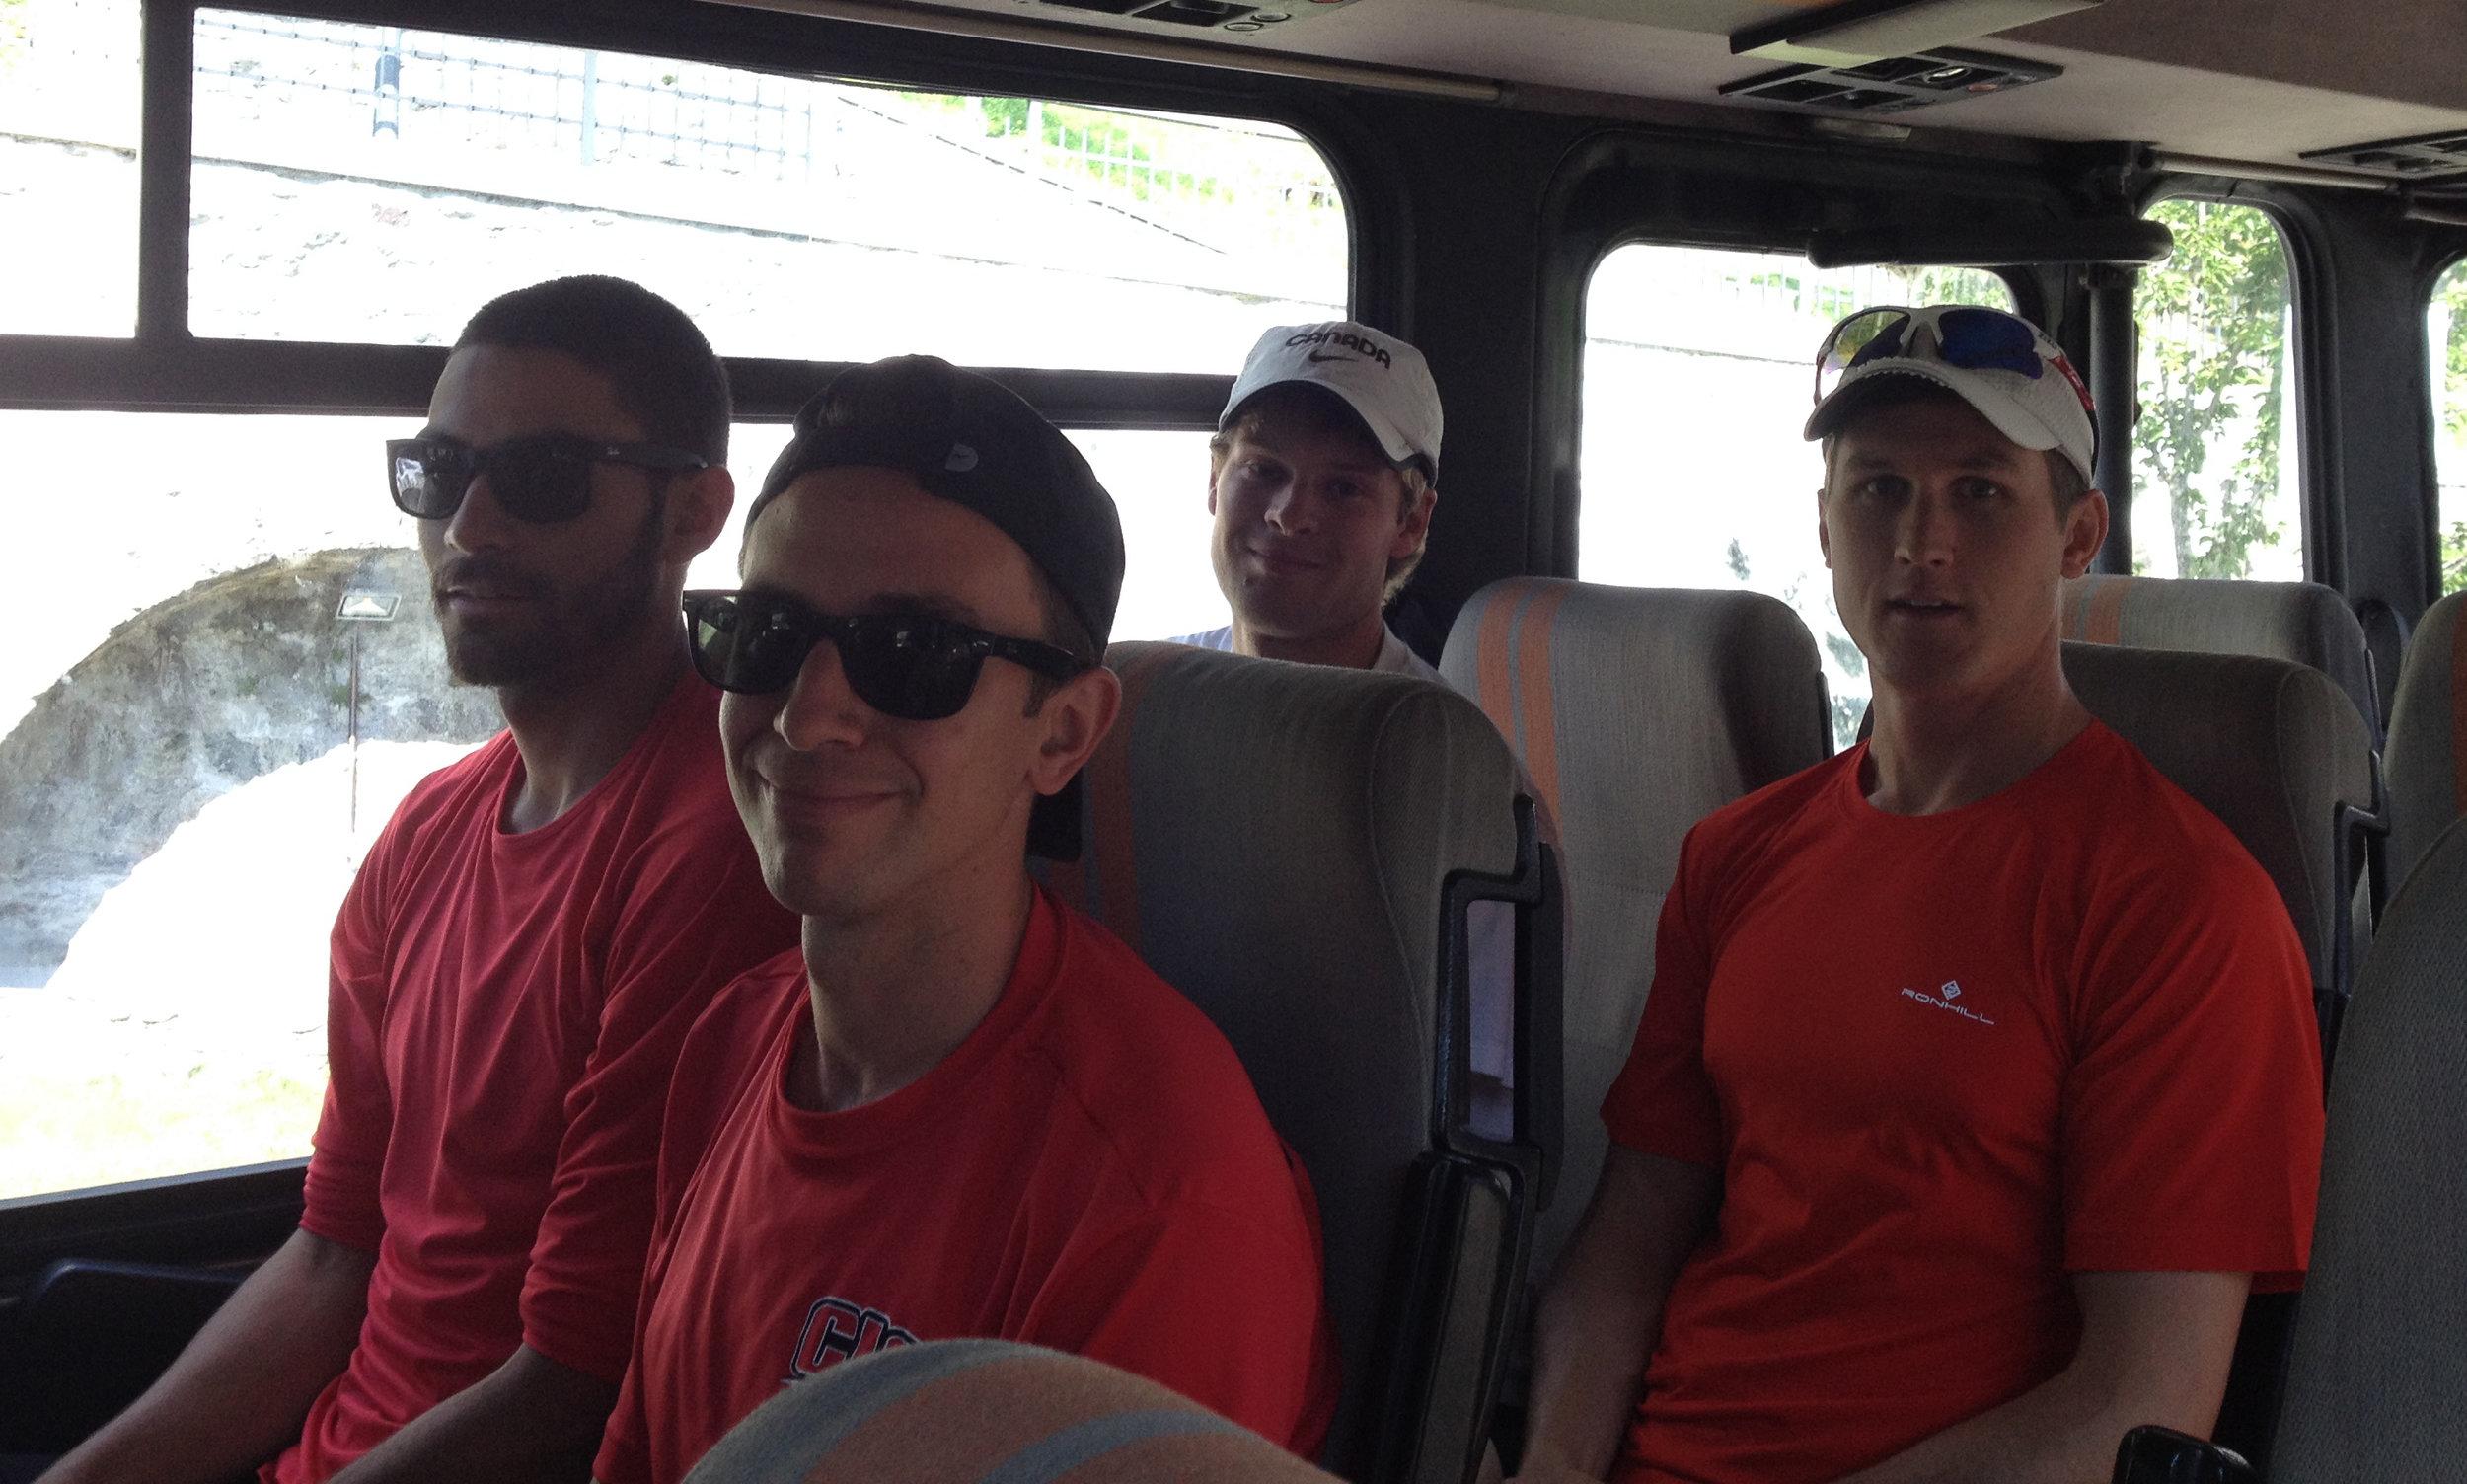 Taking the bus to the race start: Senior Men's Team -MattT, Allan, Gareth, MattS